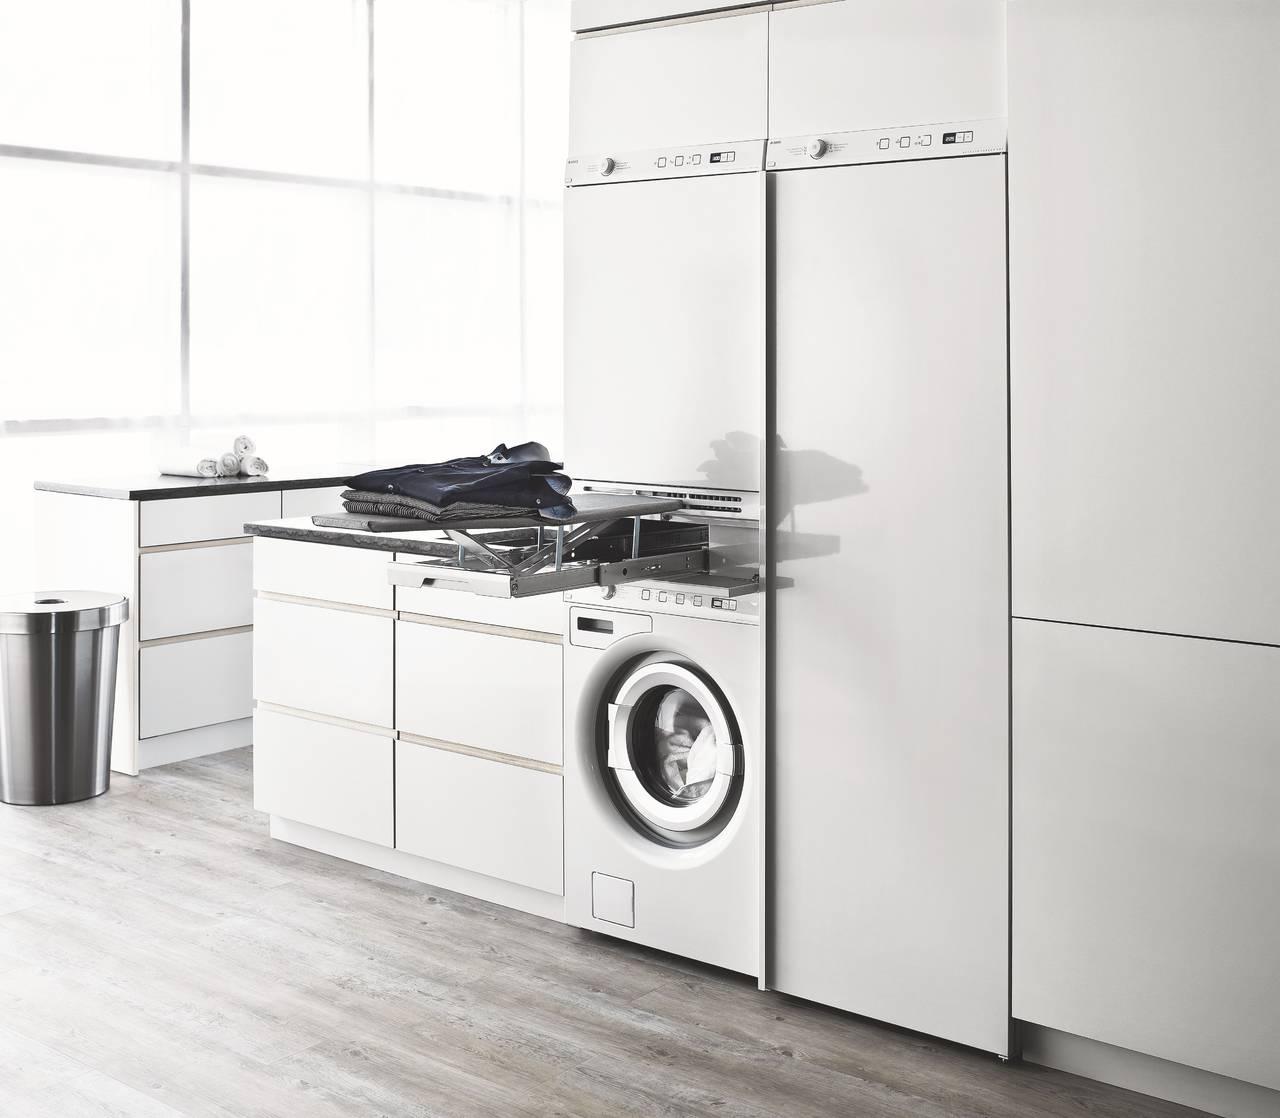 Asko lavanderia per la cucina